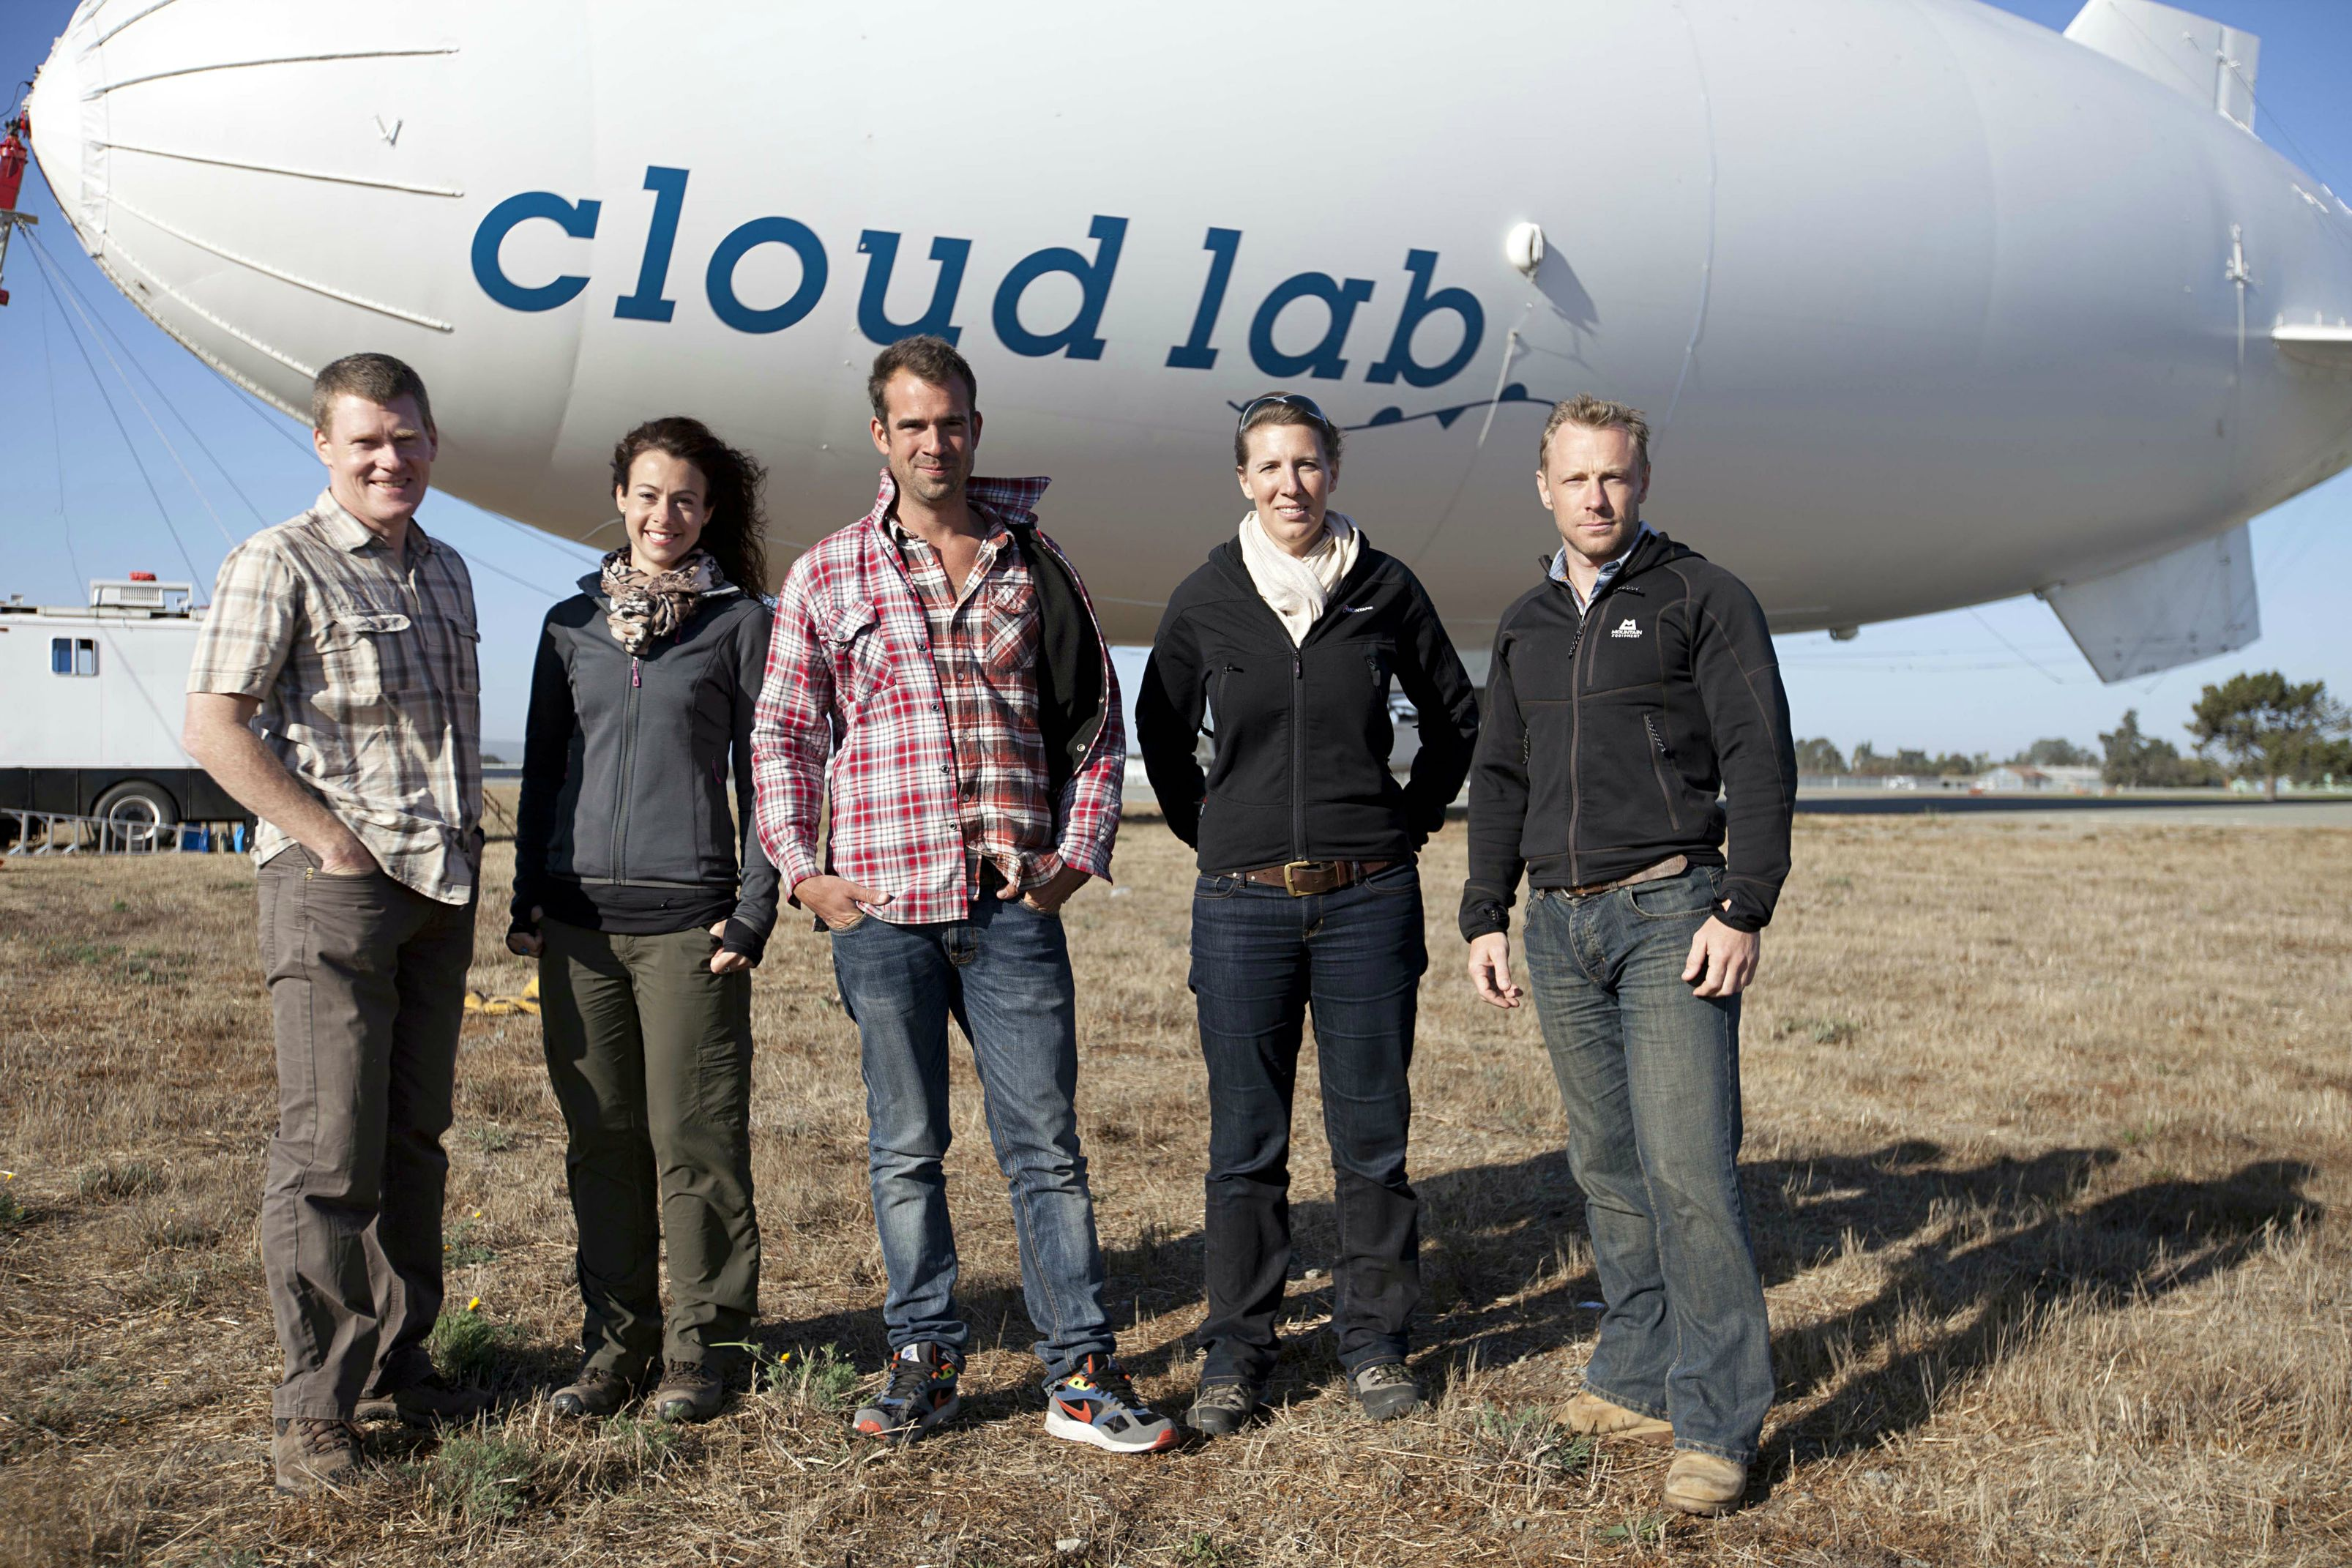 Operation Cloud Lab: Season 1